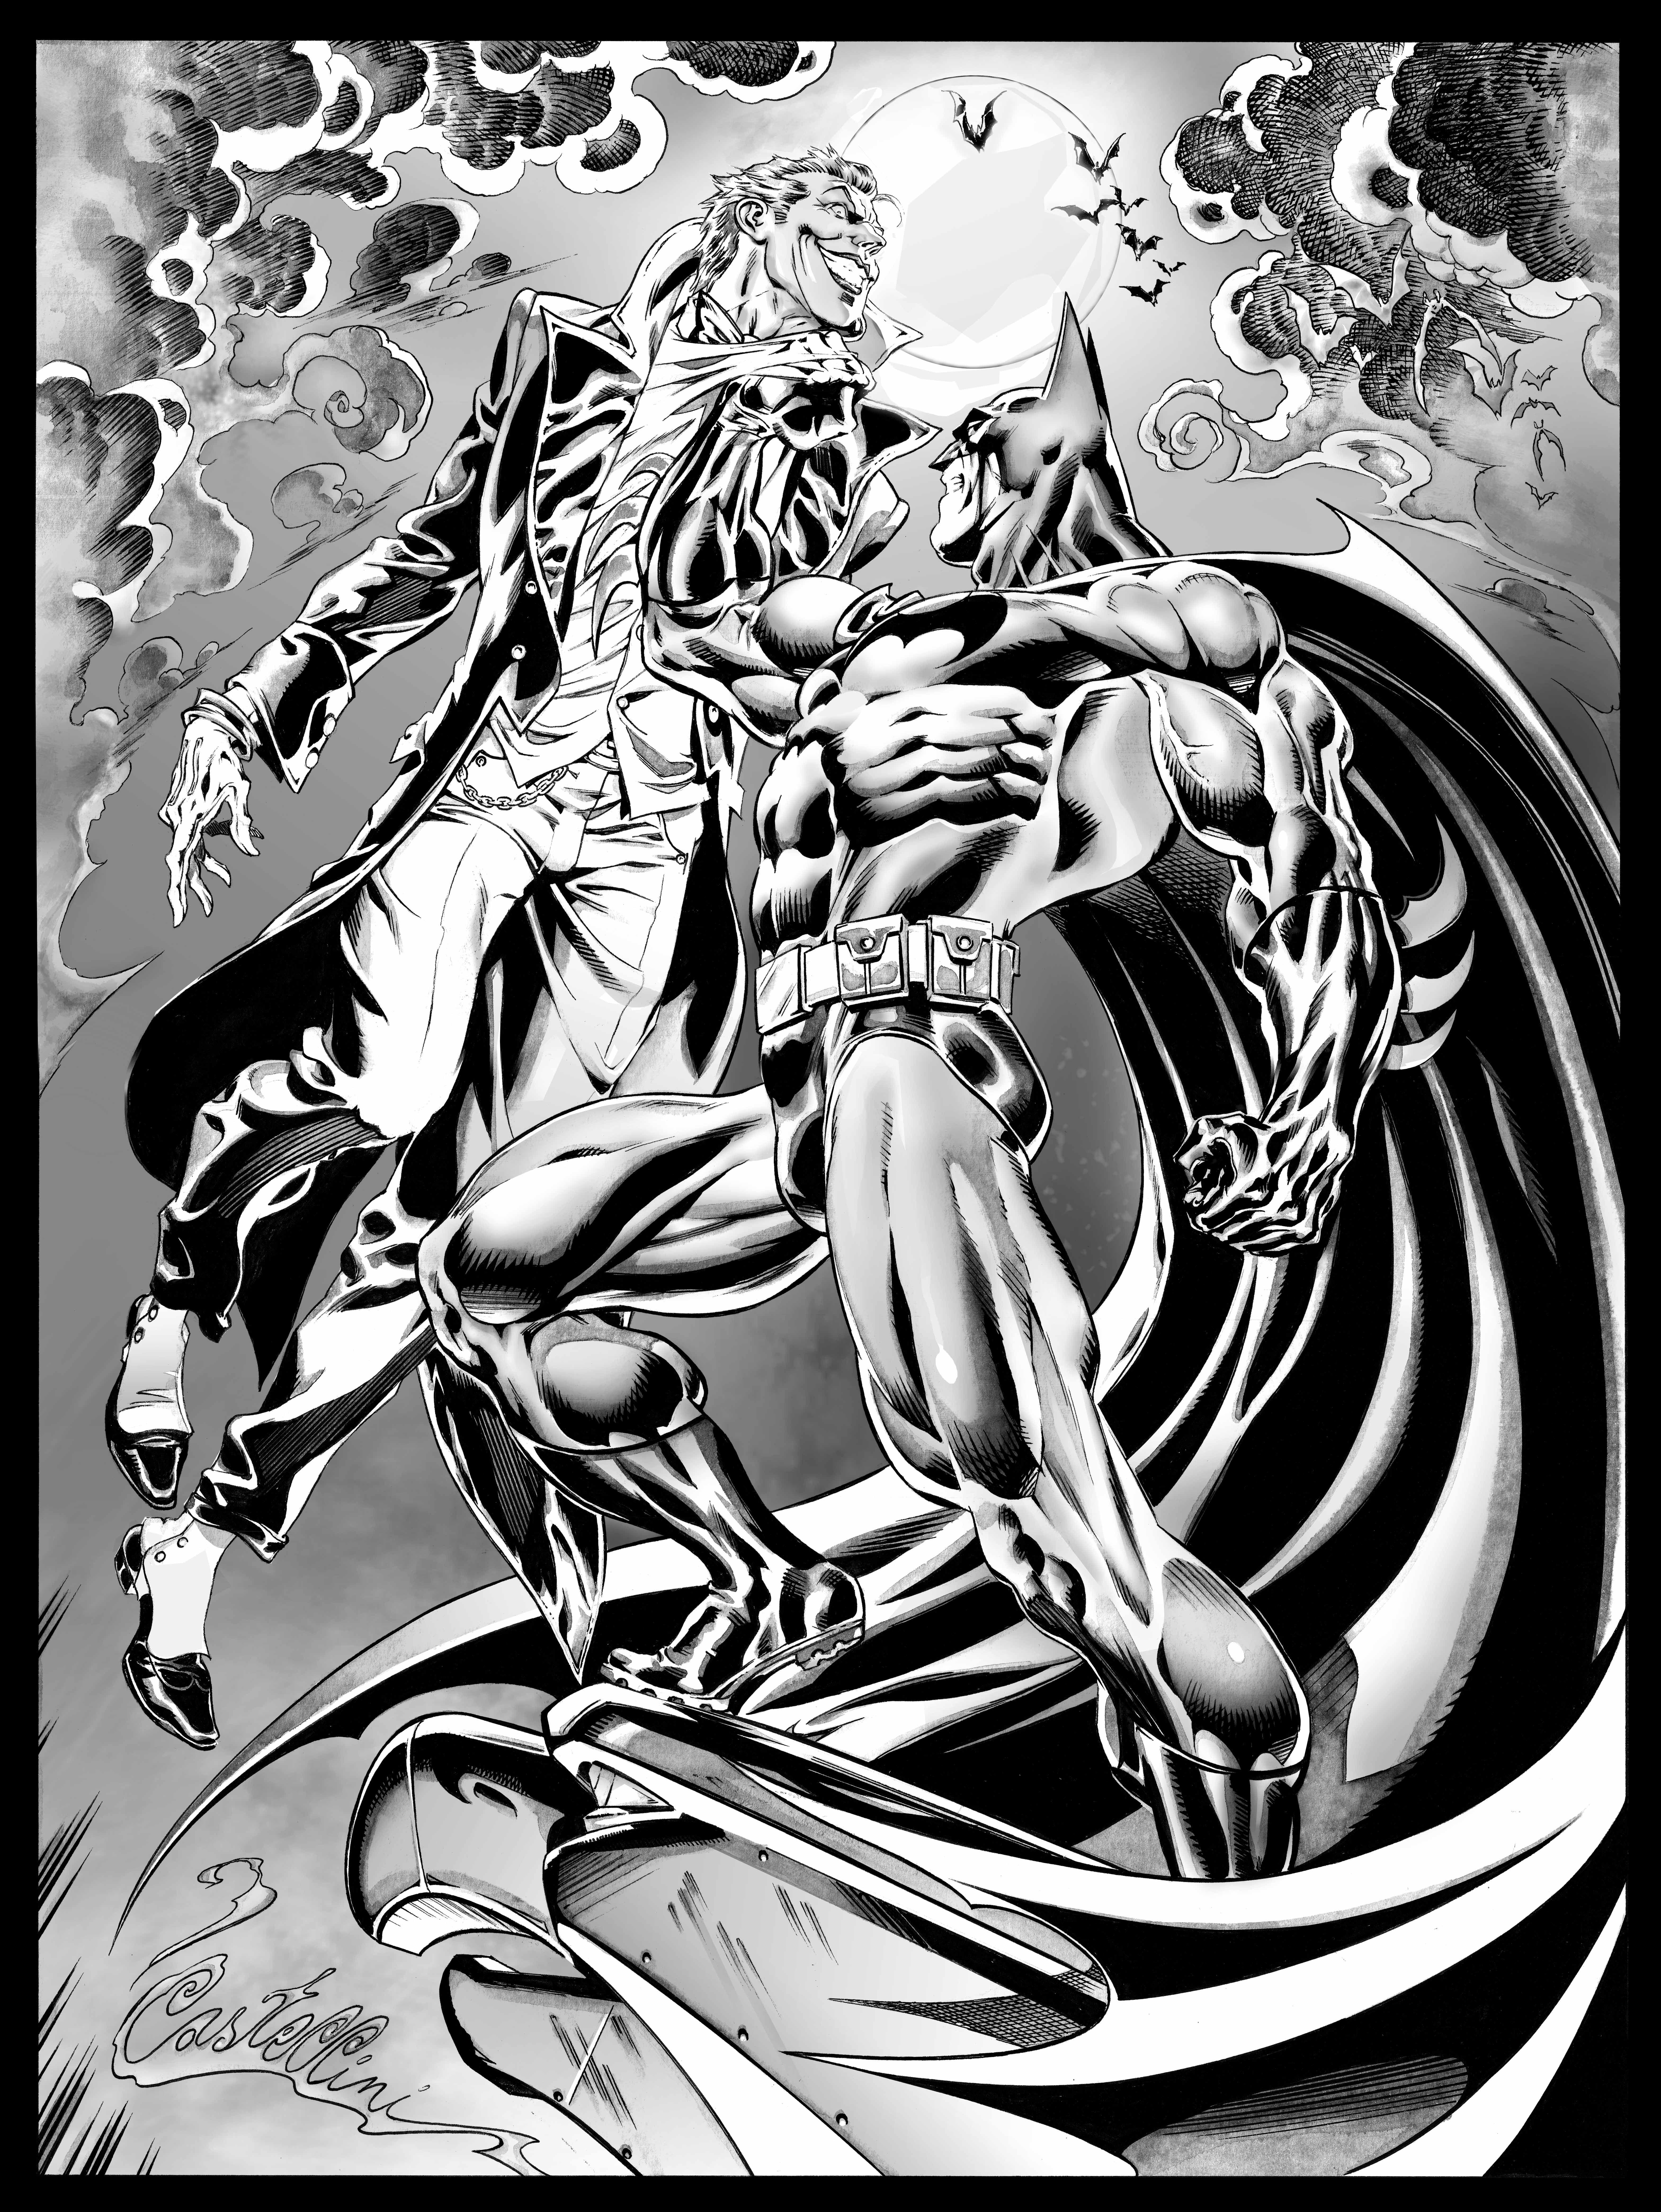 Batman Vs Joker By Claudio Castellini Comic Book Legends